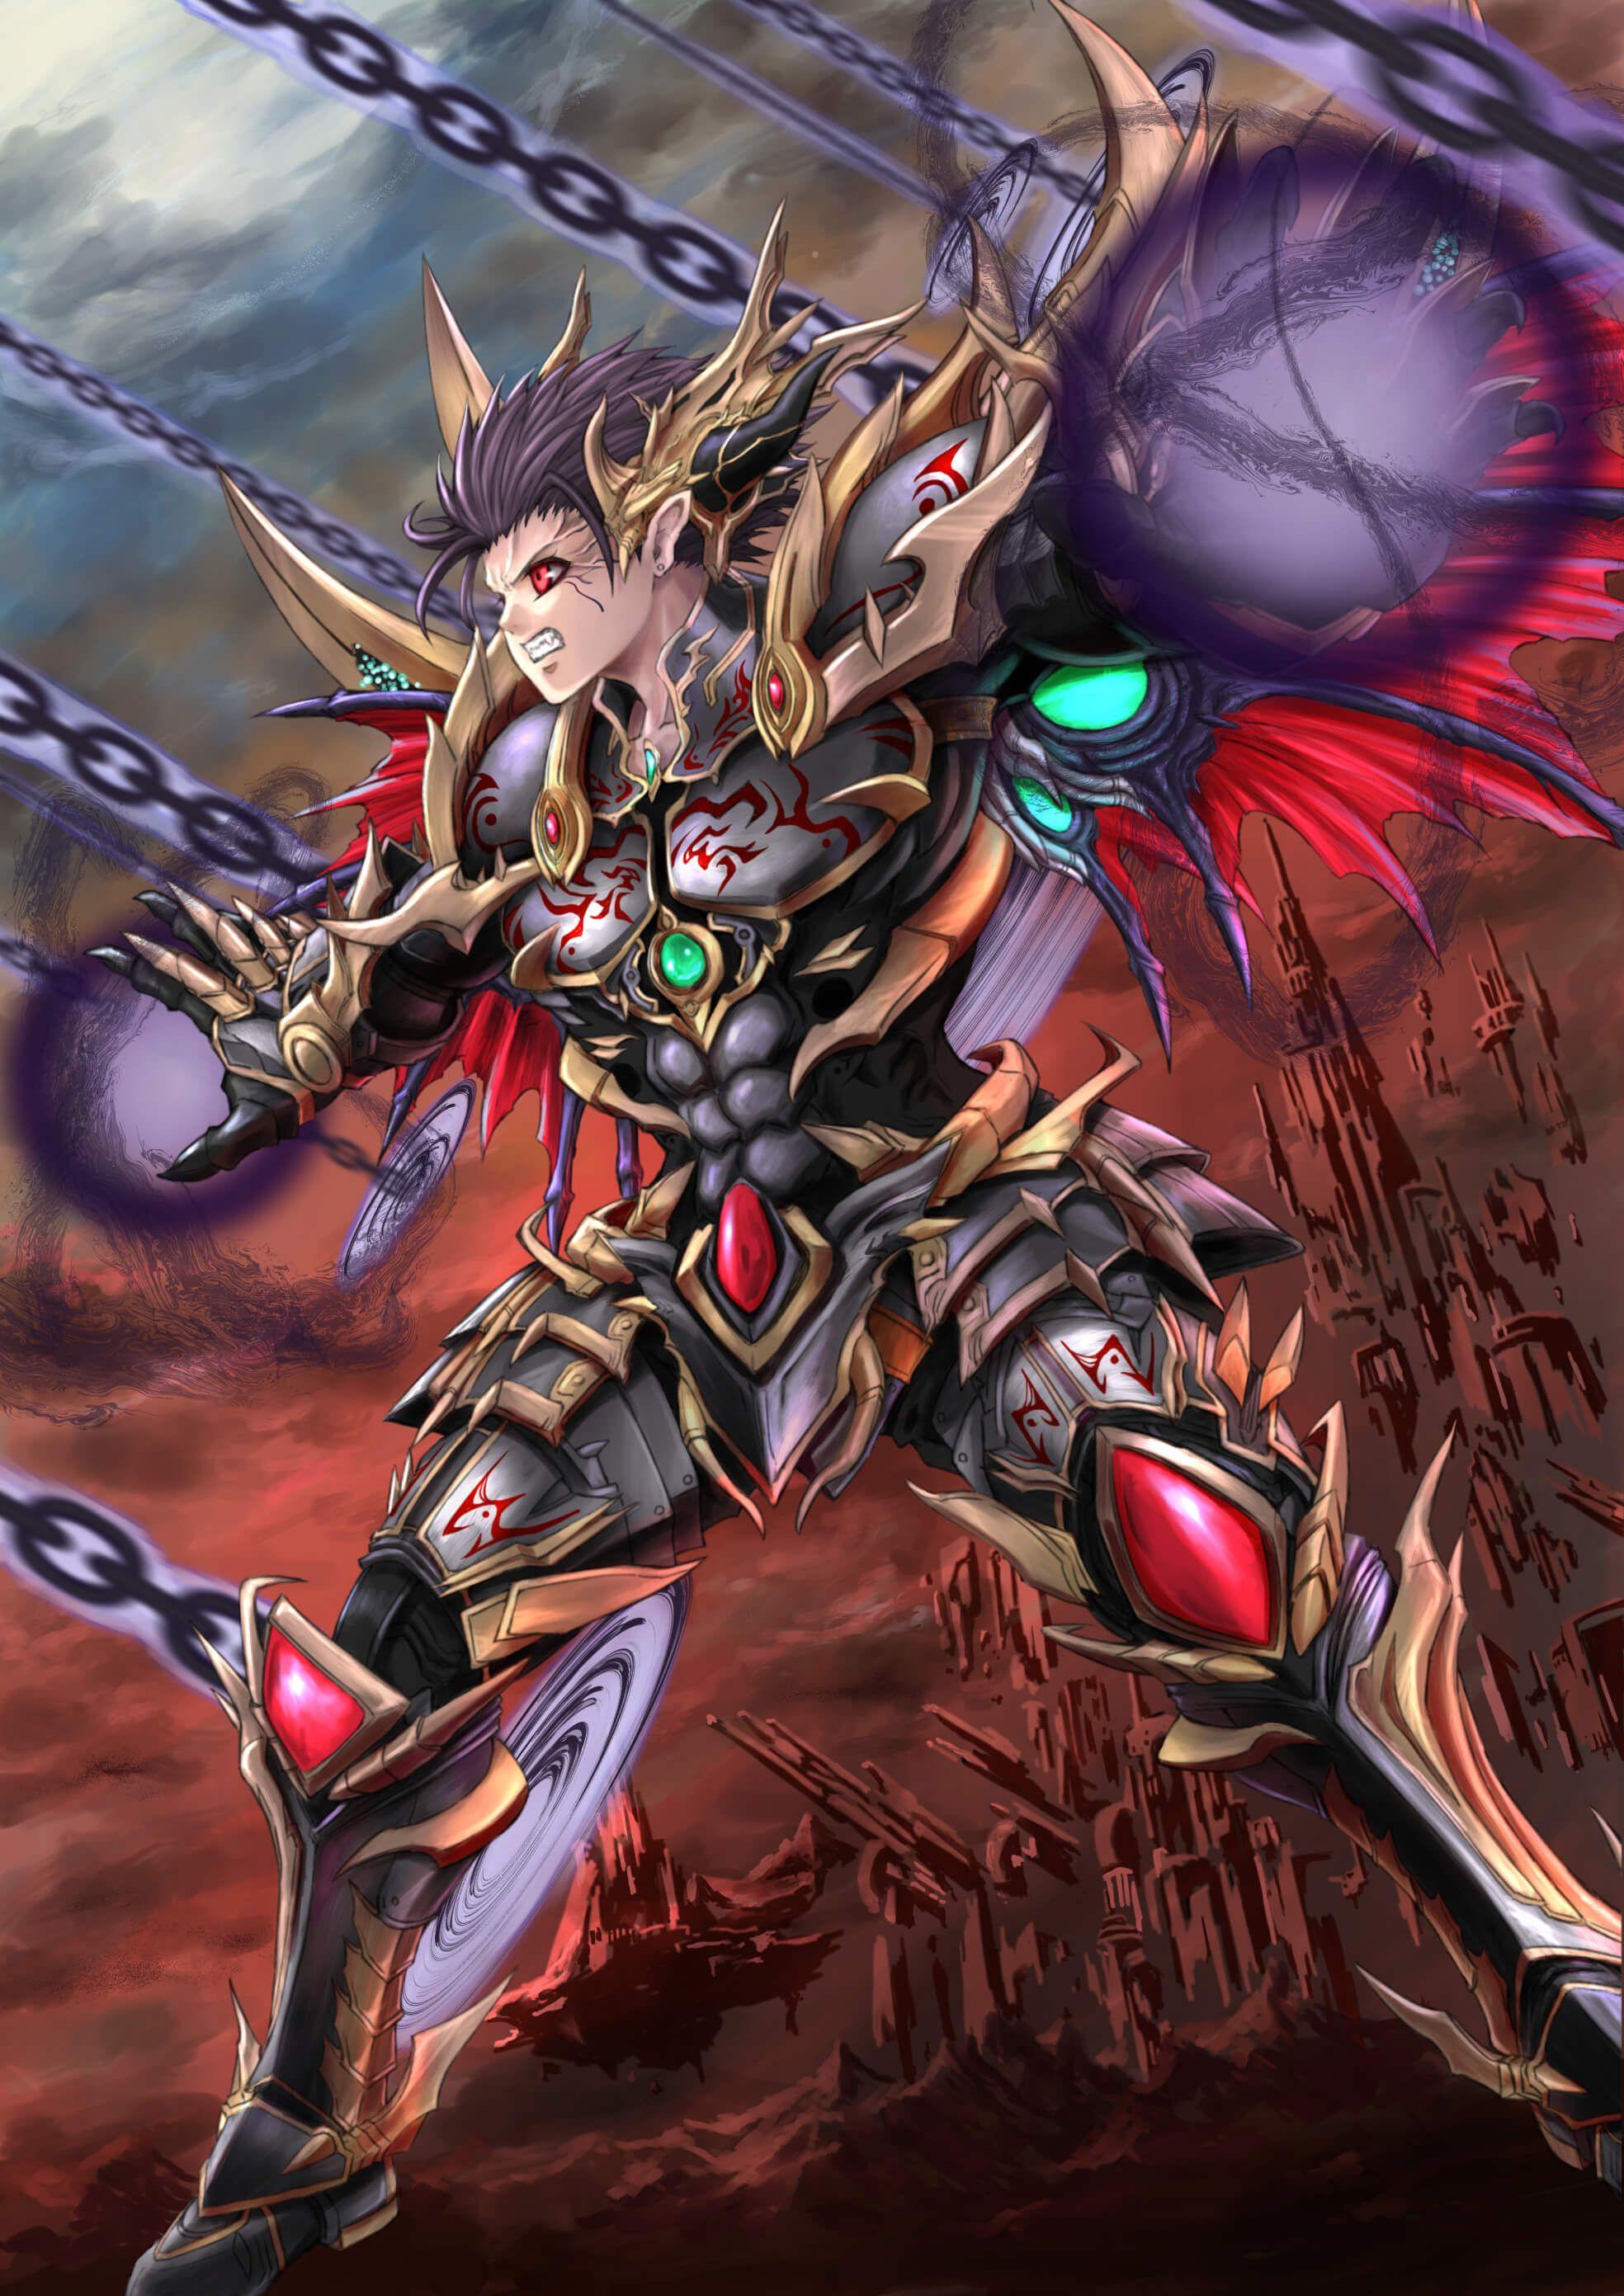 Pin by Supa Sta on art Fantasy character design, Fantasy